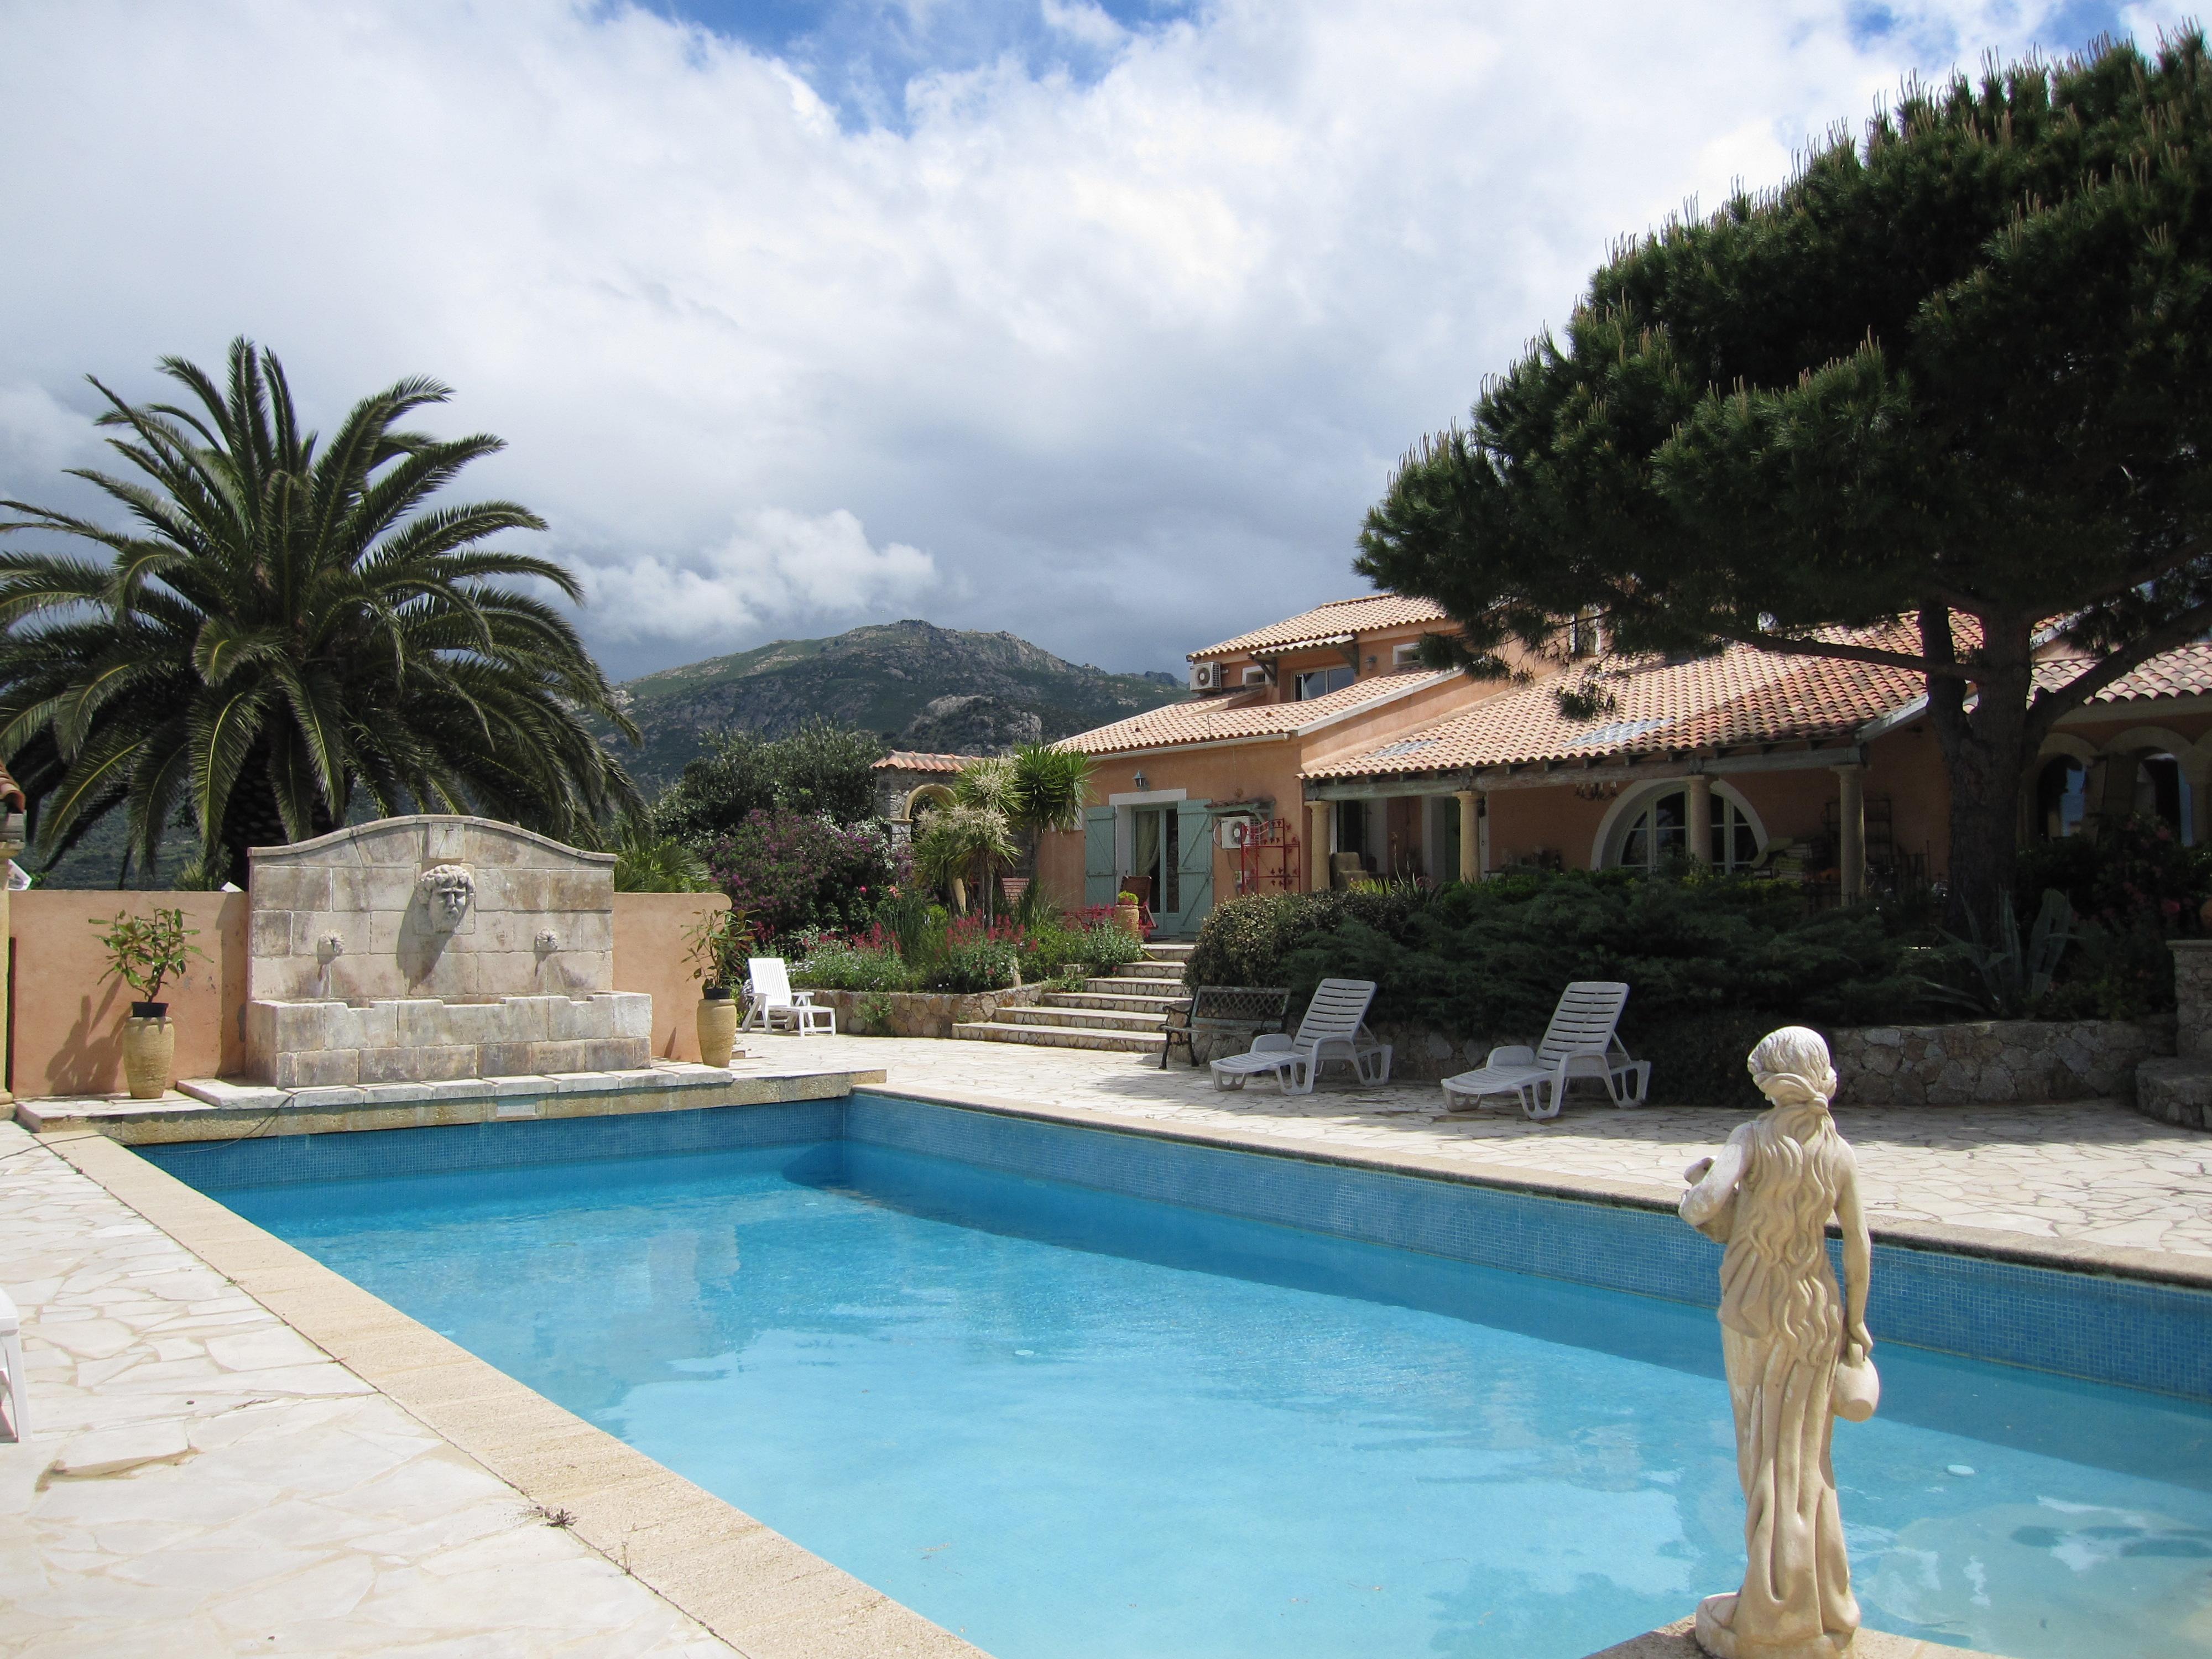 Villa Opvntia Gite et Chambres d H´tes Calvi Table d H´te